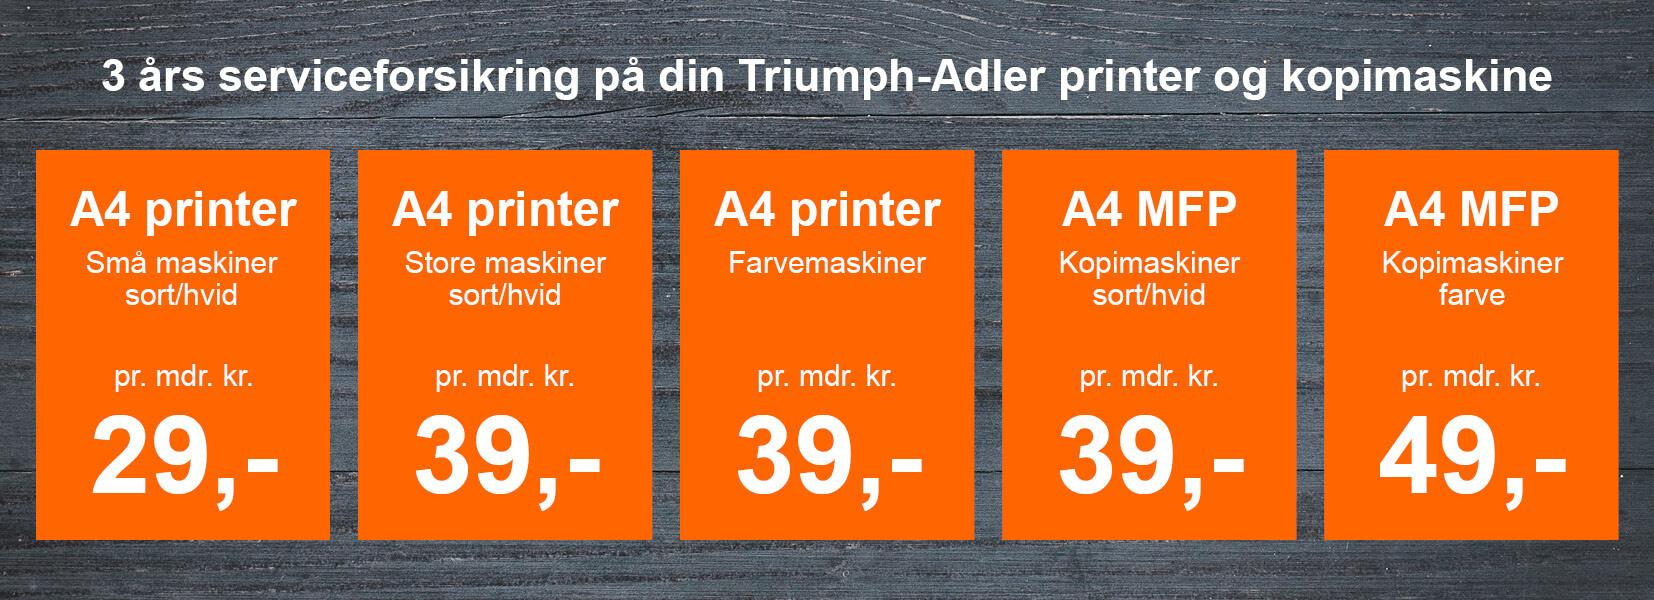 TA Triumph-Adler serviceaftale